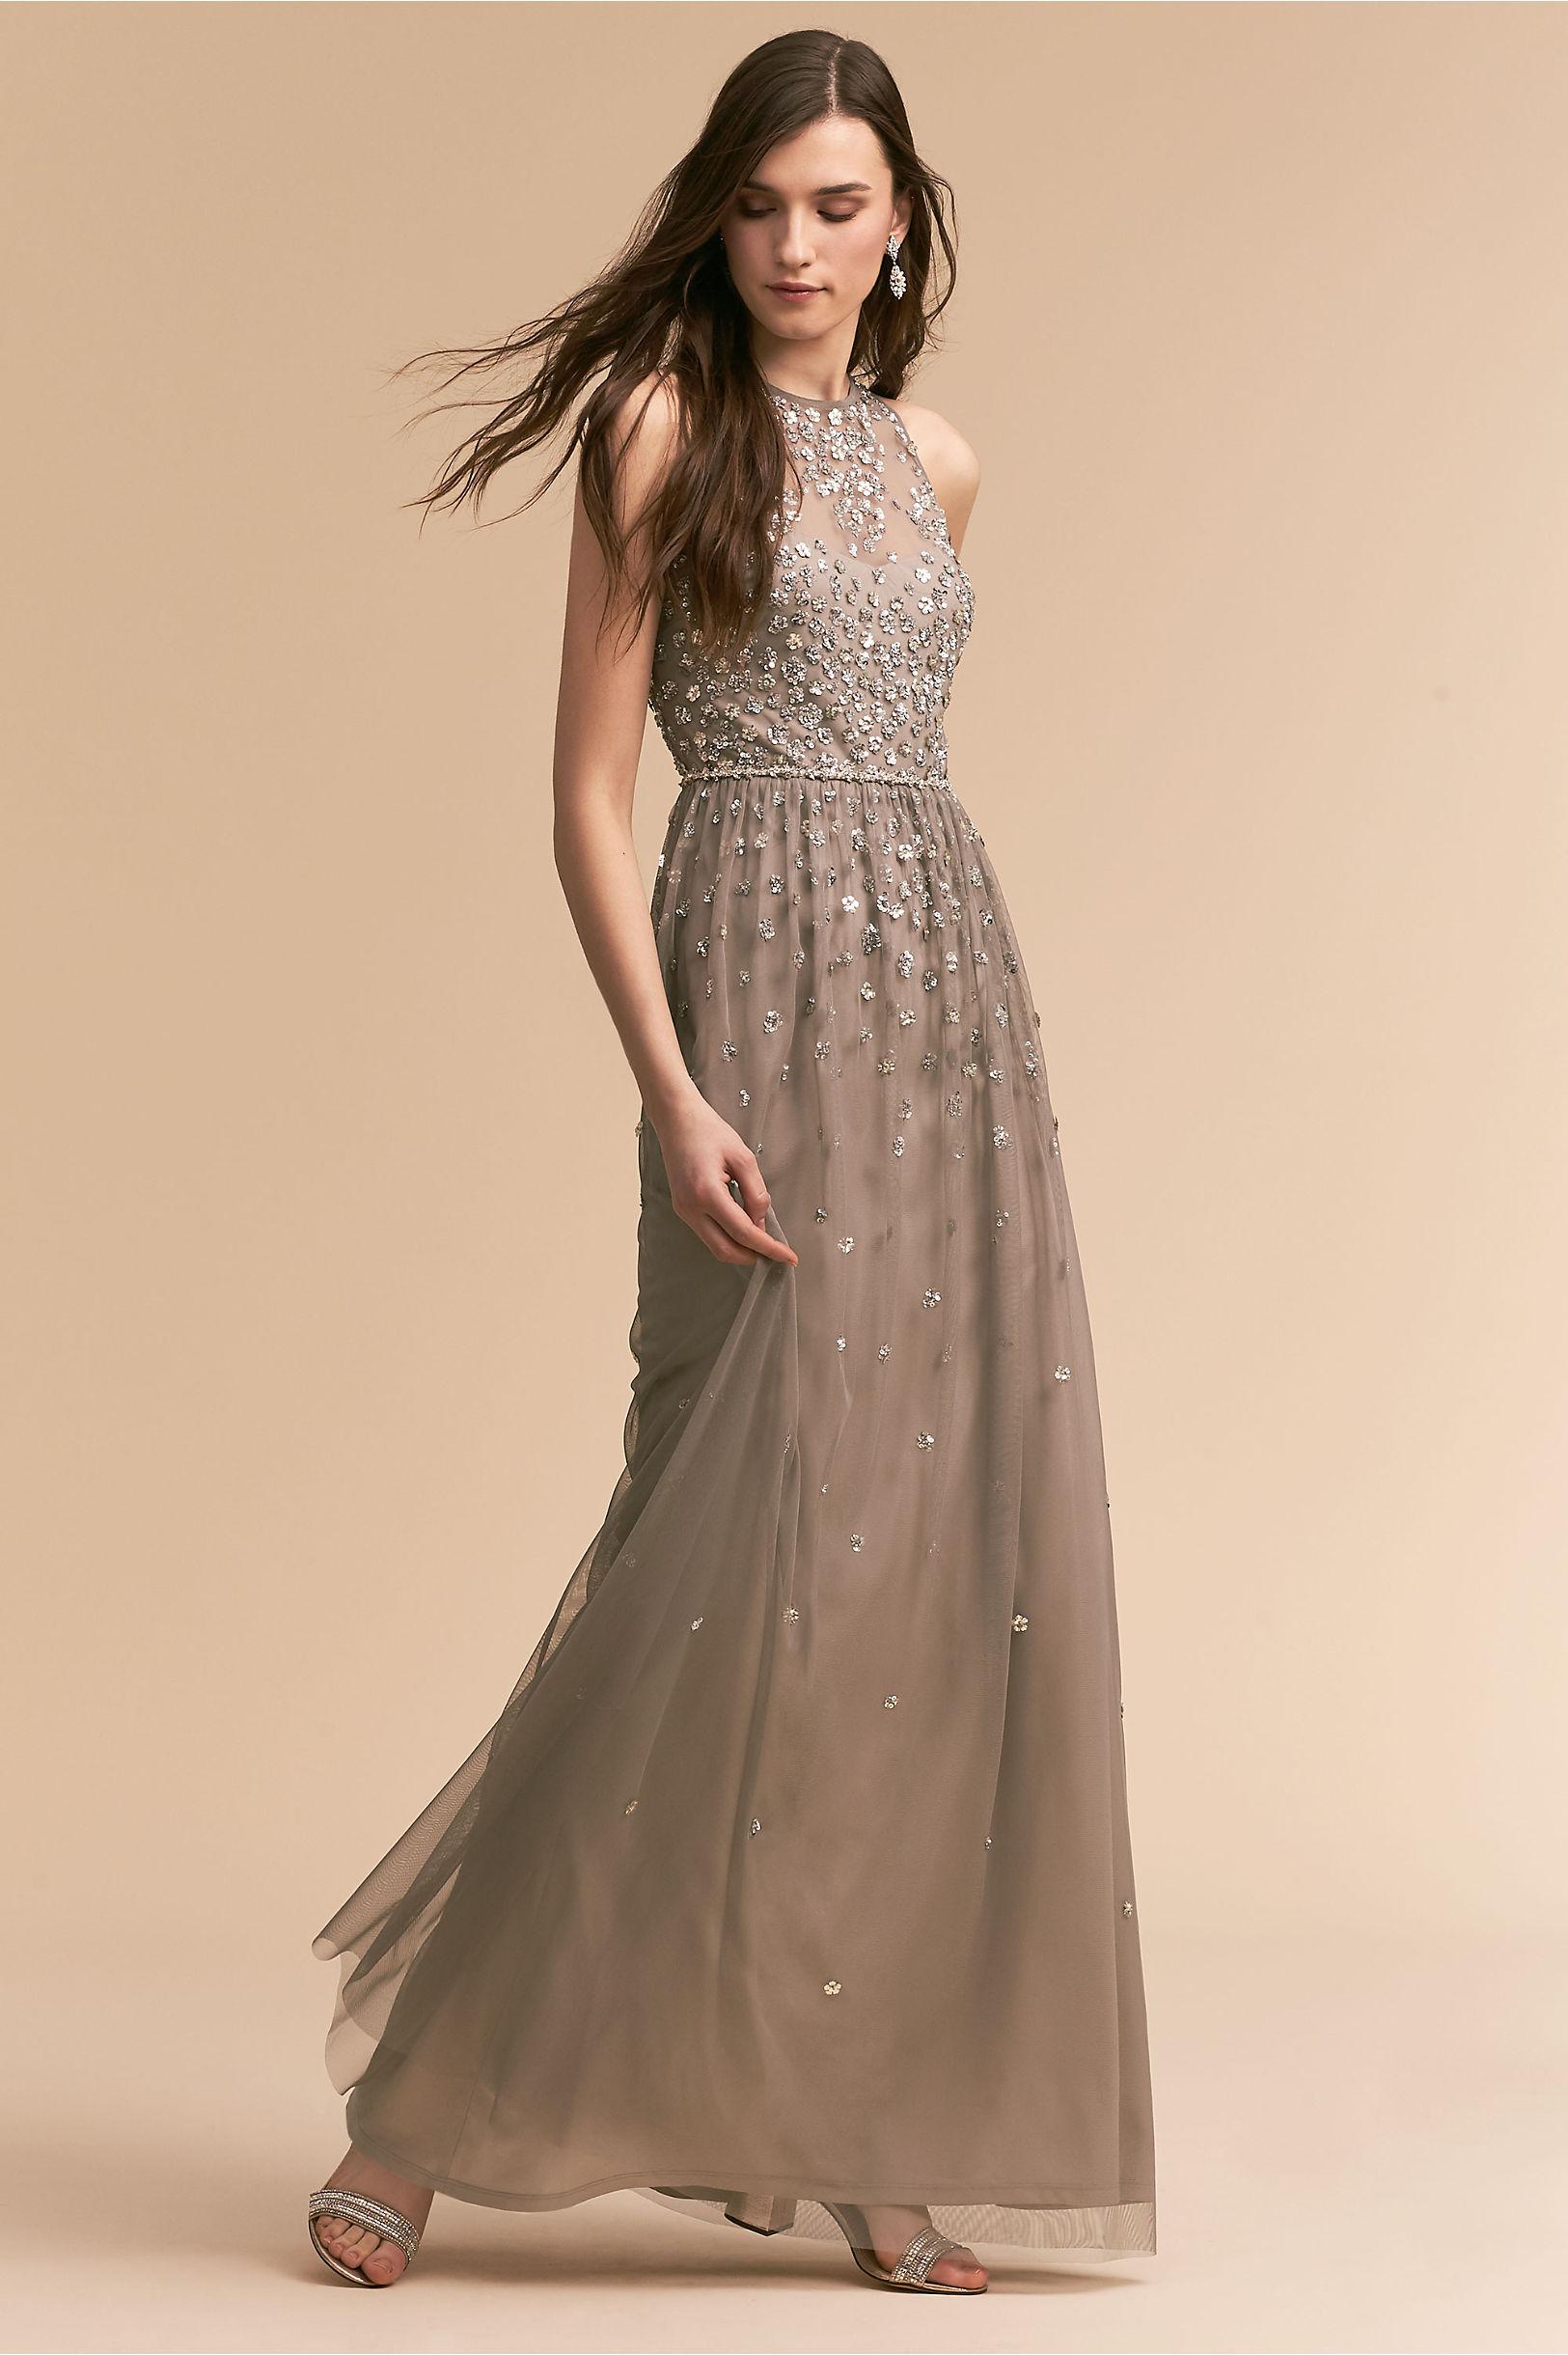 Long bridesmaid dresses gowns chiffon styles bhldn ginny dress ombrellifo Choice Image